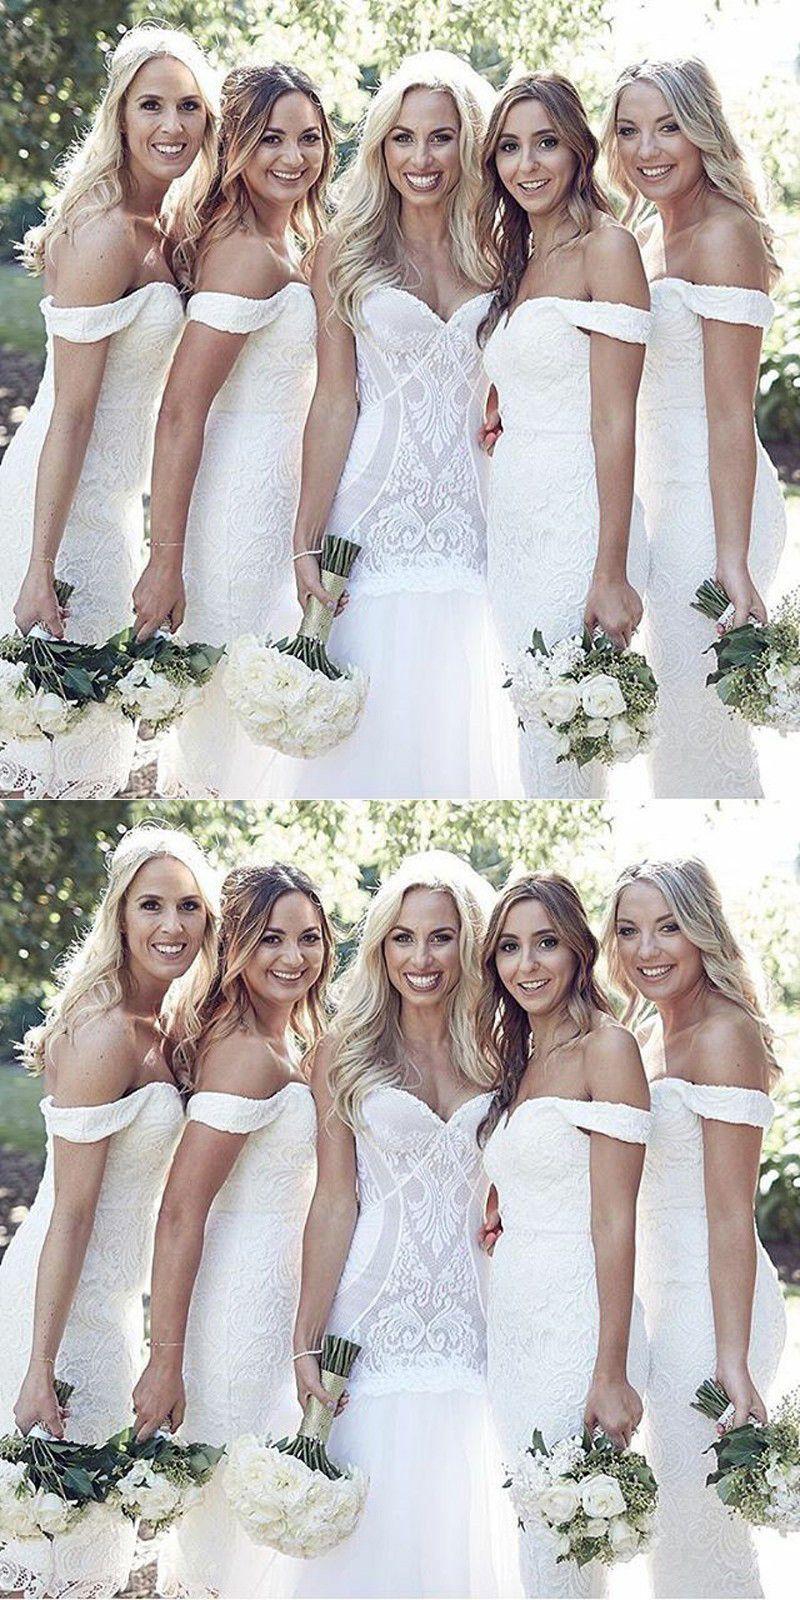 Sheath Off The Shoulder Short White Lace Bridesmaid Dress White Lace Bridesmaid Long Bridesmaid Dresses Mermaid Bridesmaid Dresses [ 1600 x 800 Pixel ]